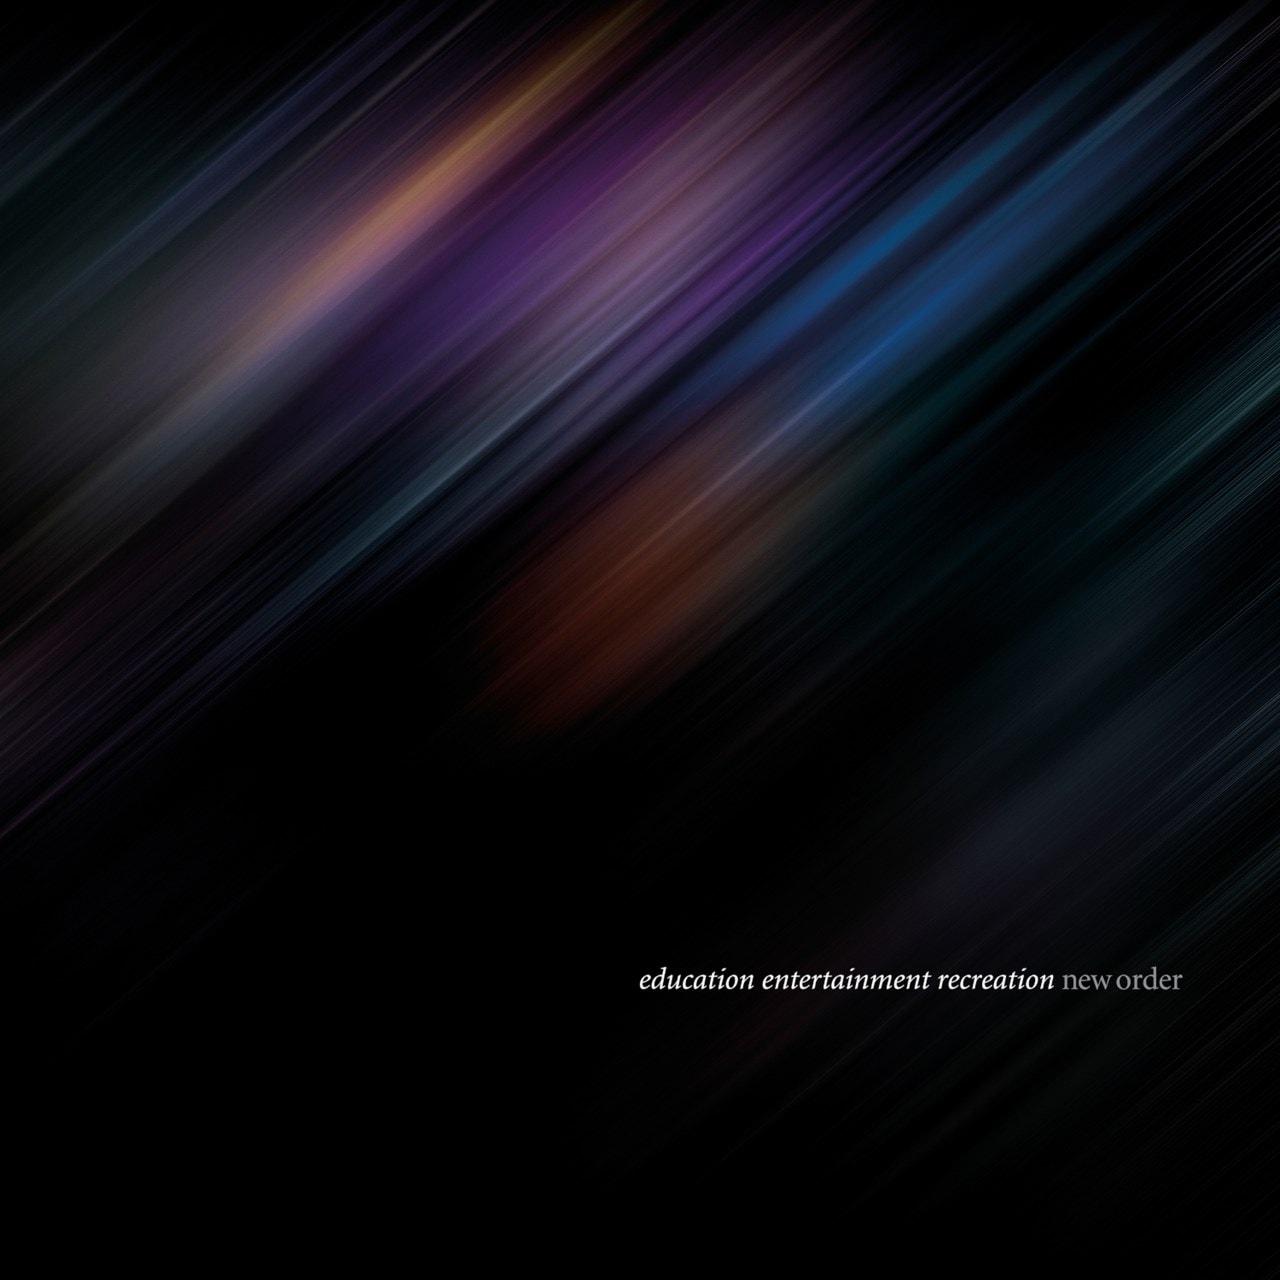 Education Entertainment Recreation - 2CD + Blu-ray - 1